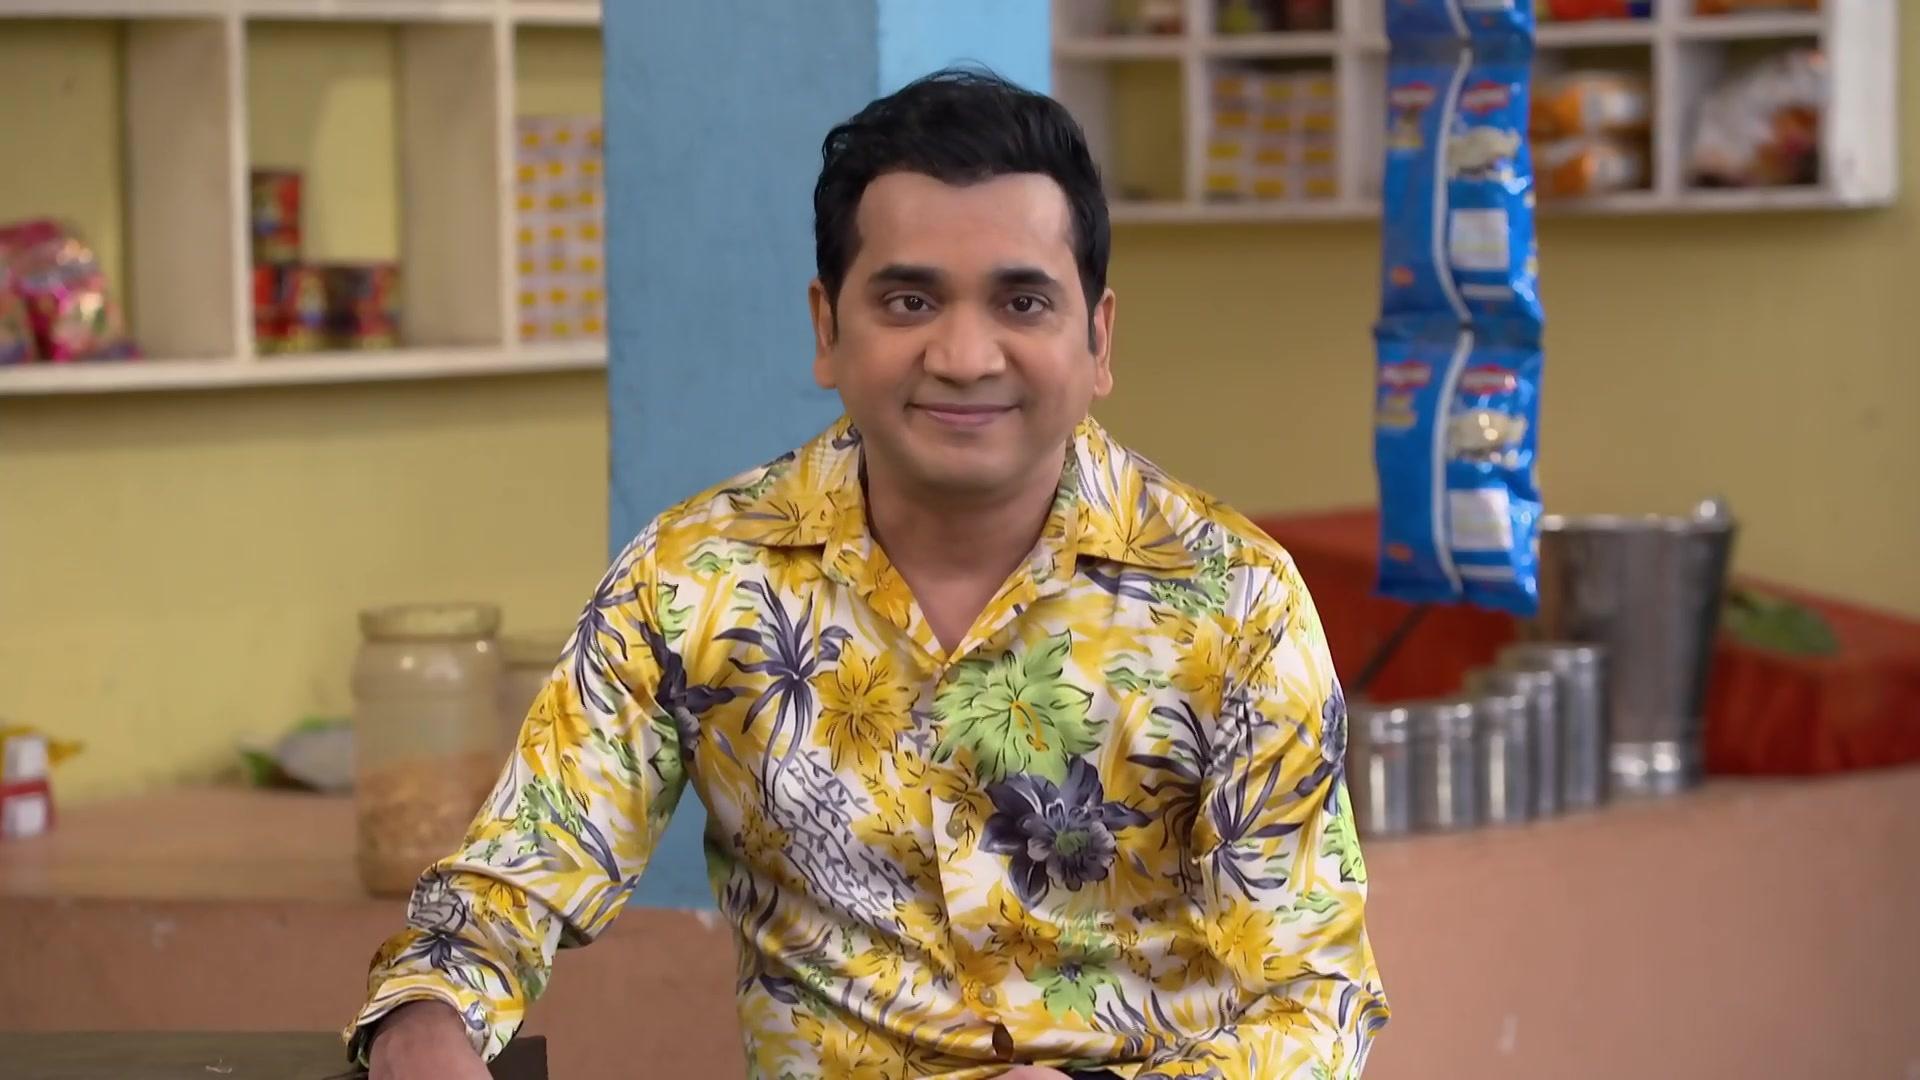 Saanand Verma - Celebrity Style in Bhabi Ji Ghar Par Hai, Episode 1460,  2021 from Episode 1460.   Charmboard